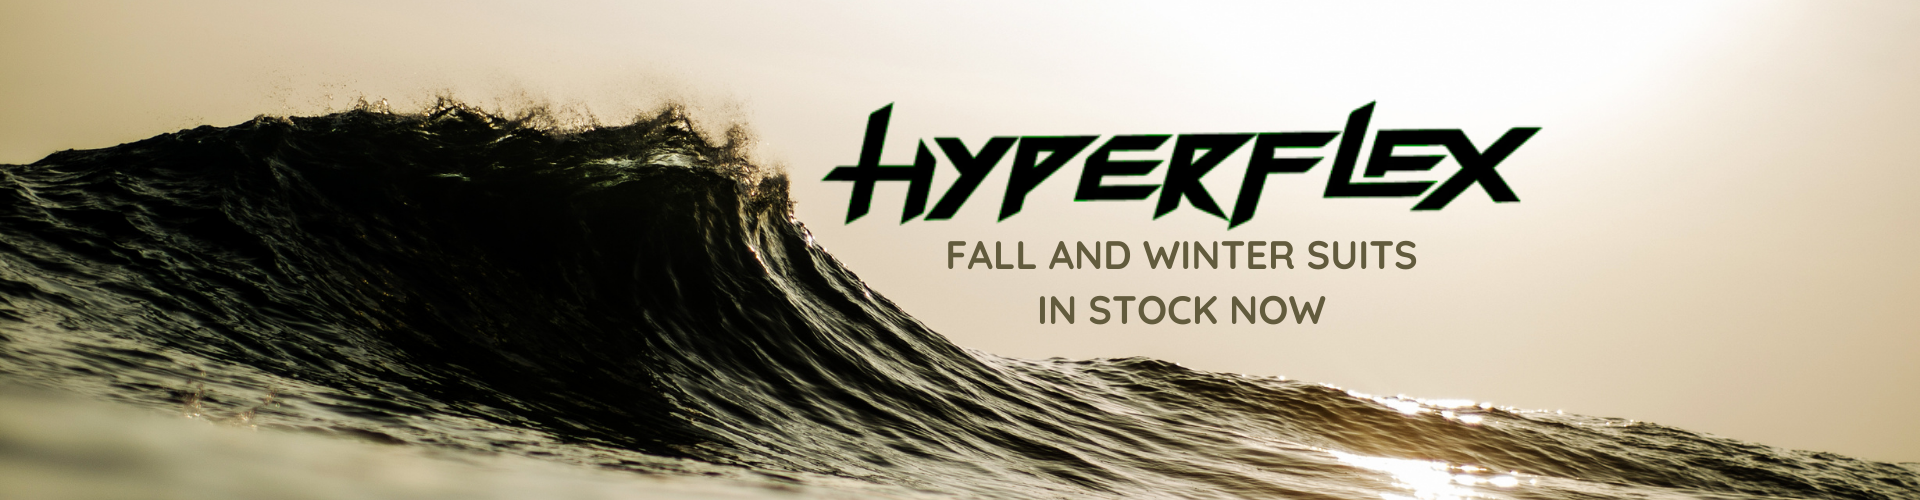 Hyperflex Suits